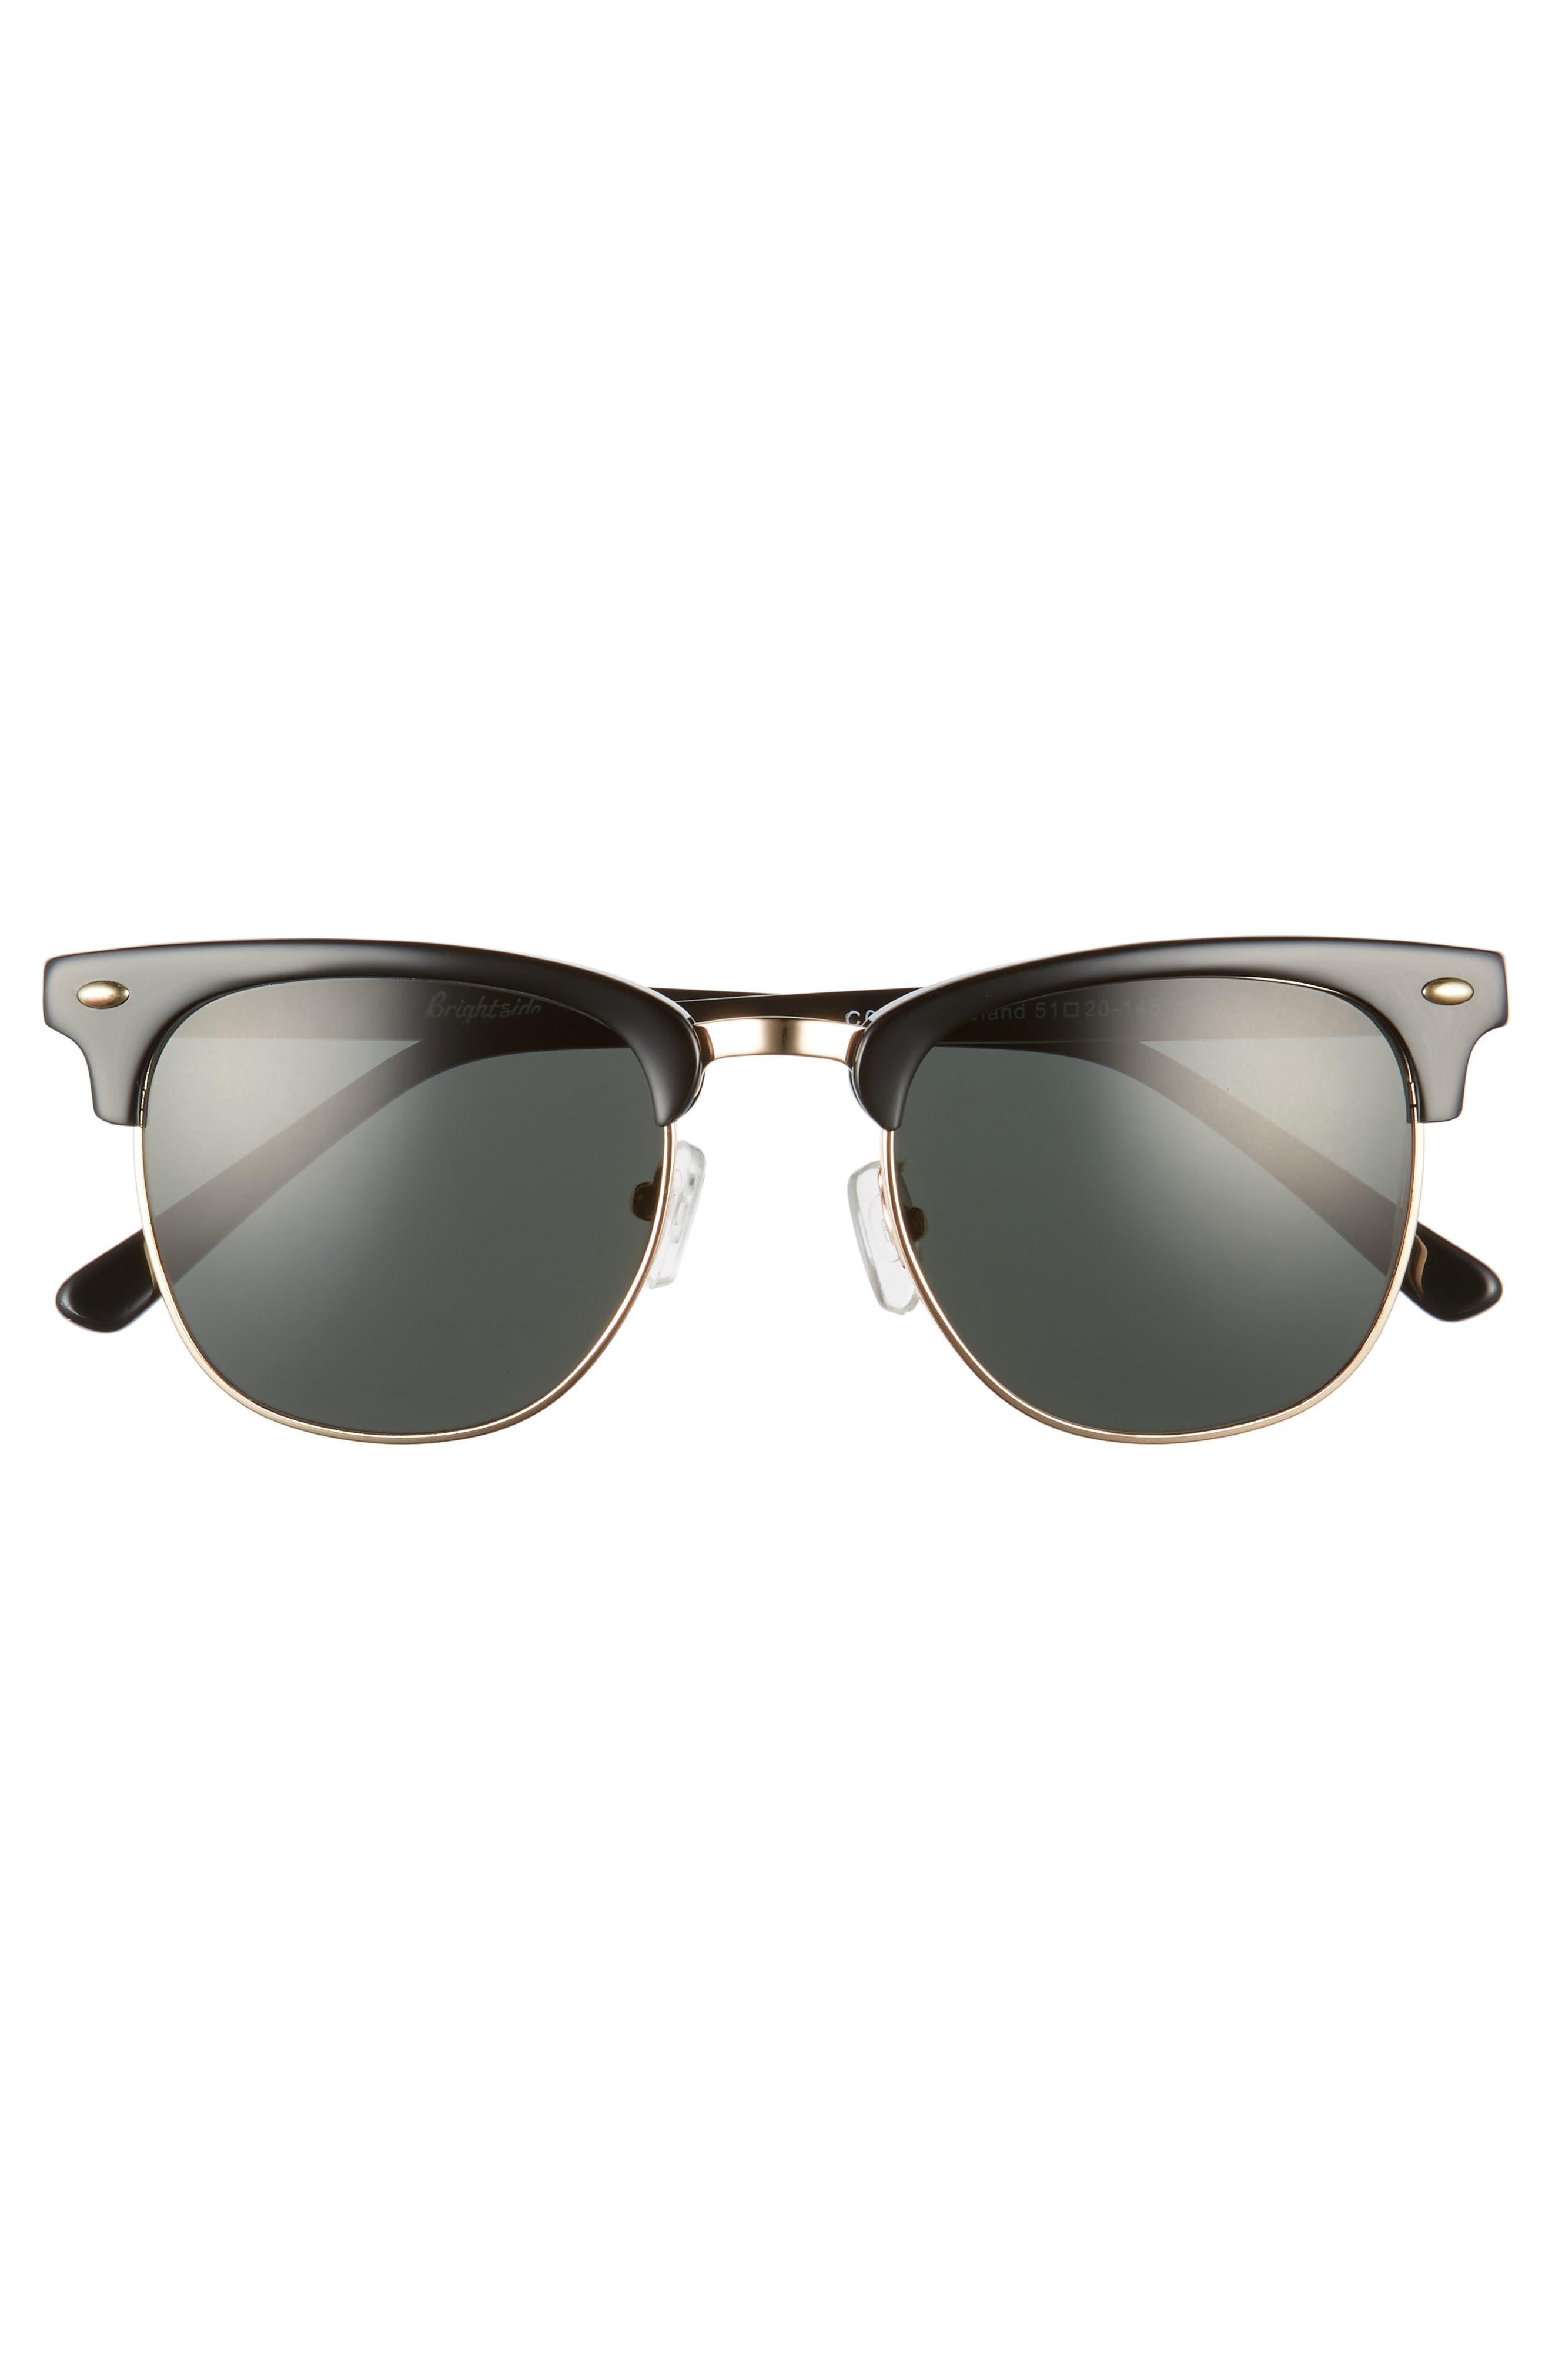 Copeland 51mm Sunglasses,                             Alternate thumbnail 3, color,                             BLACK/ GREY